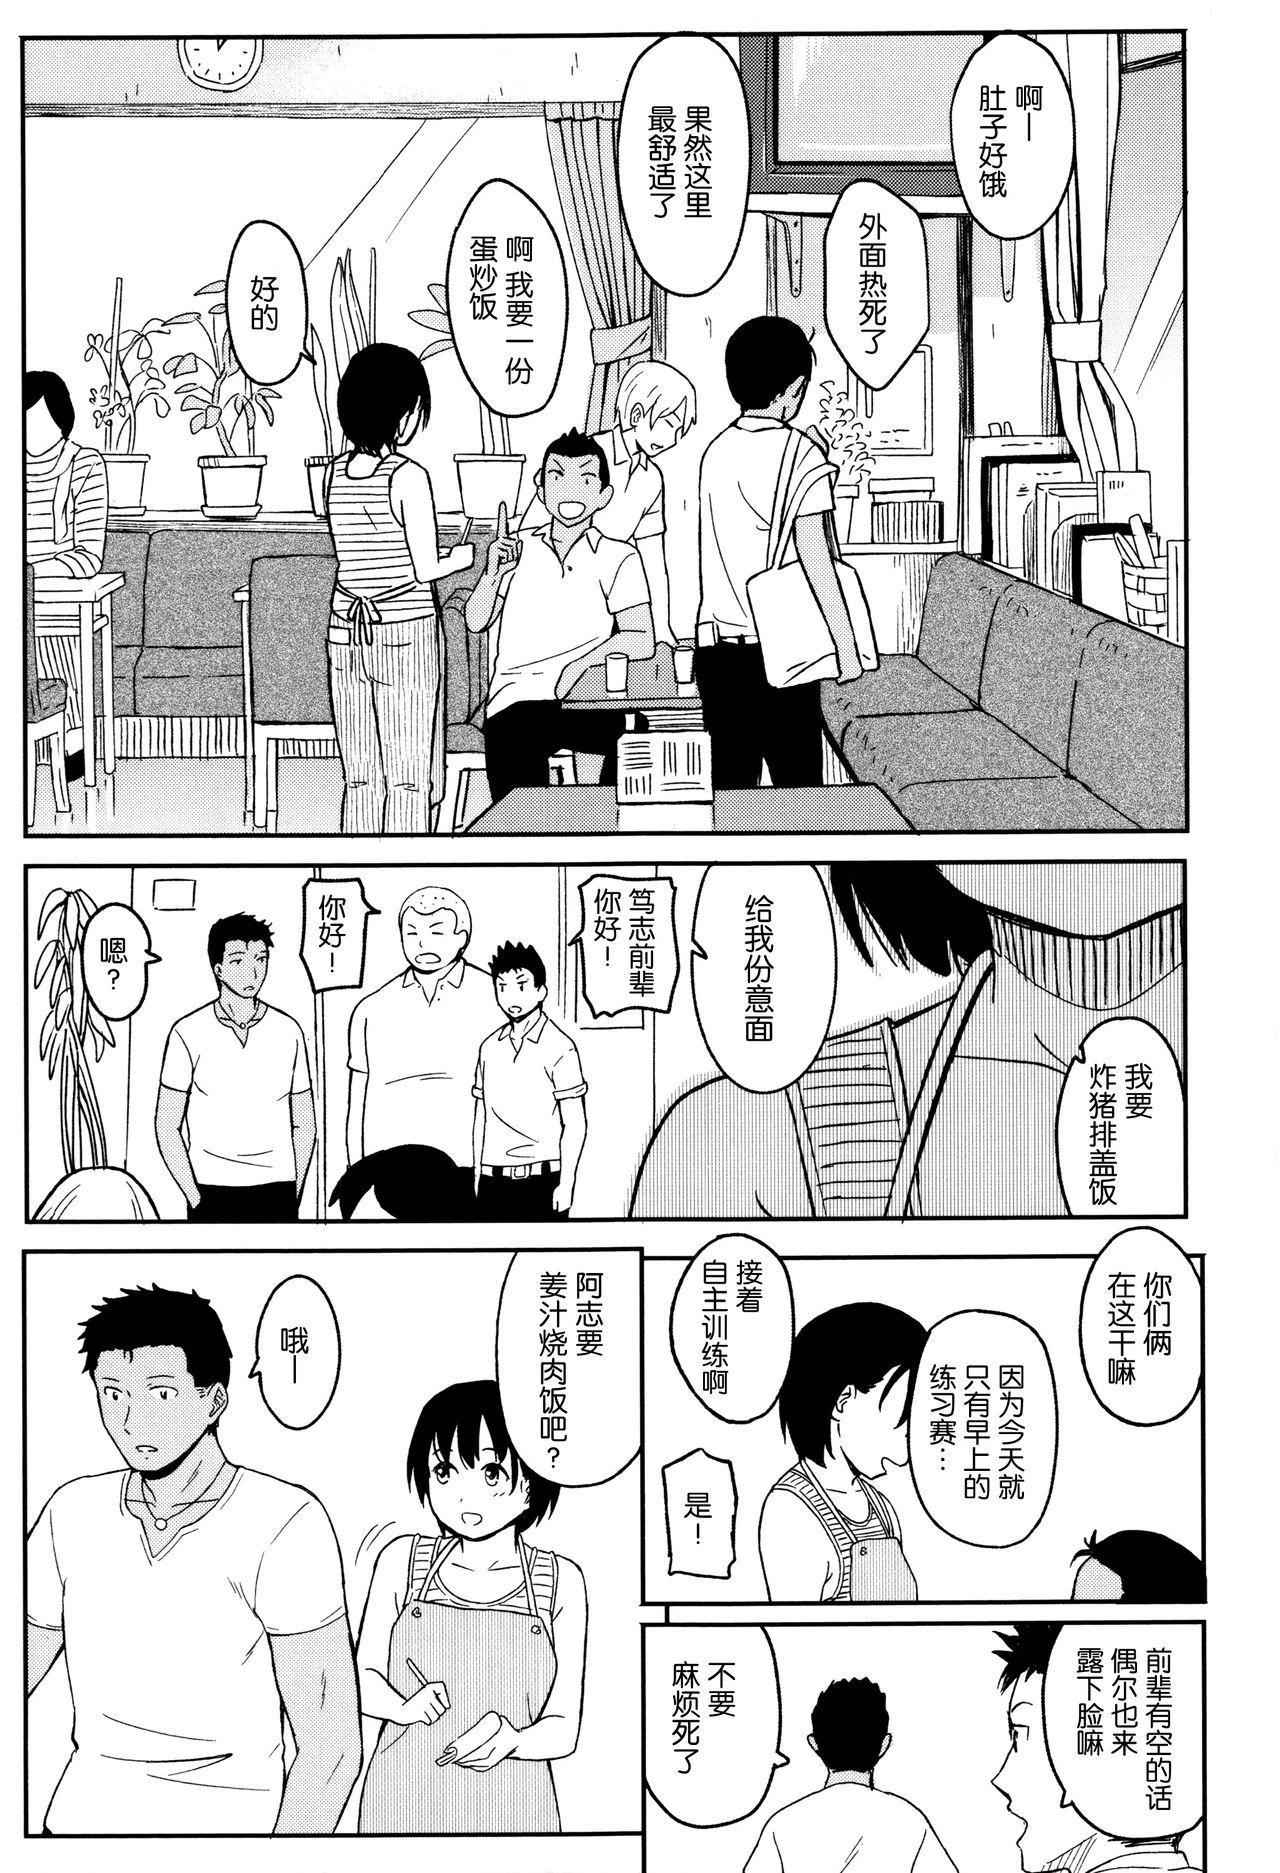 Tokubetsu na Mainichi - Special daily 175